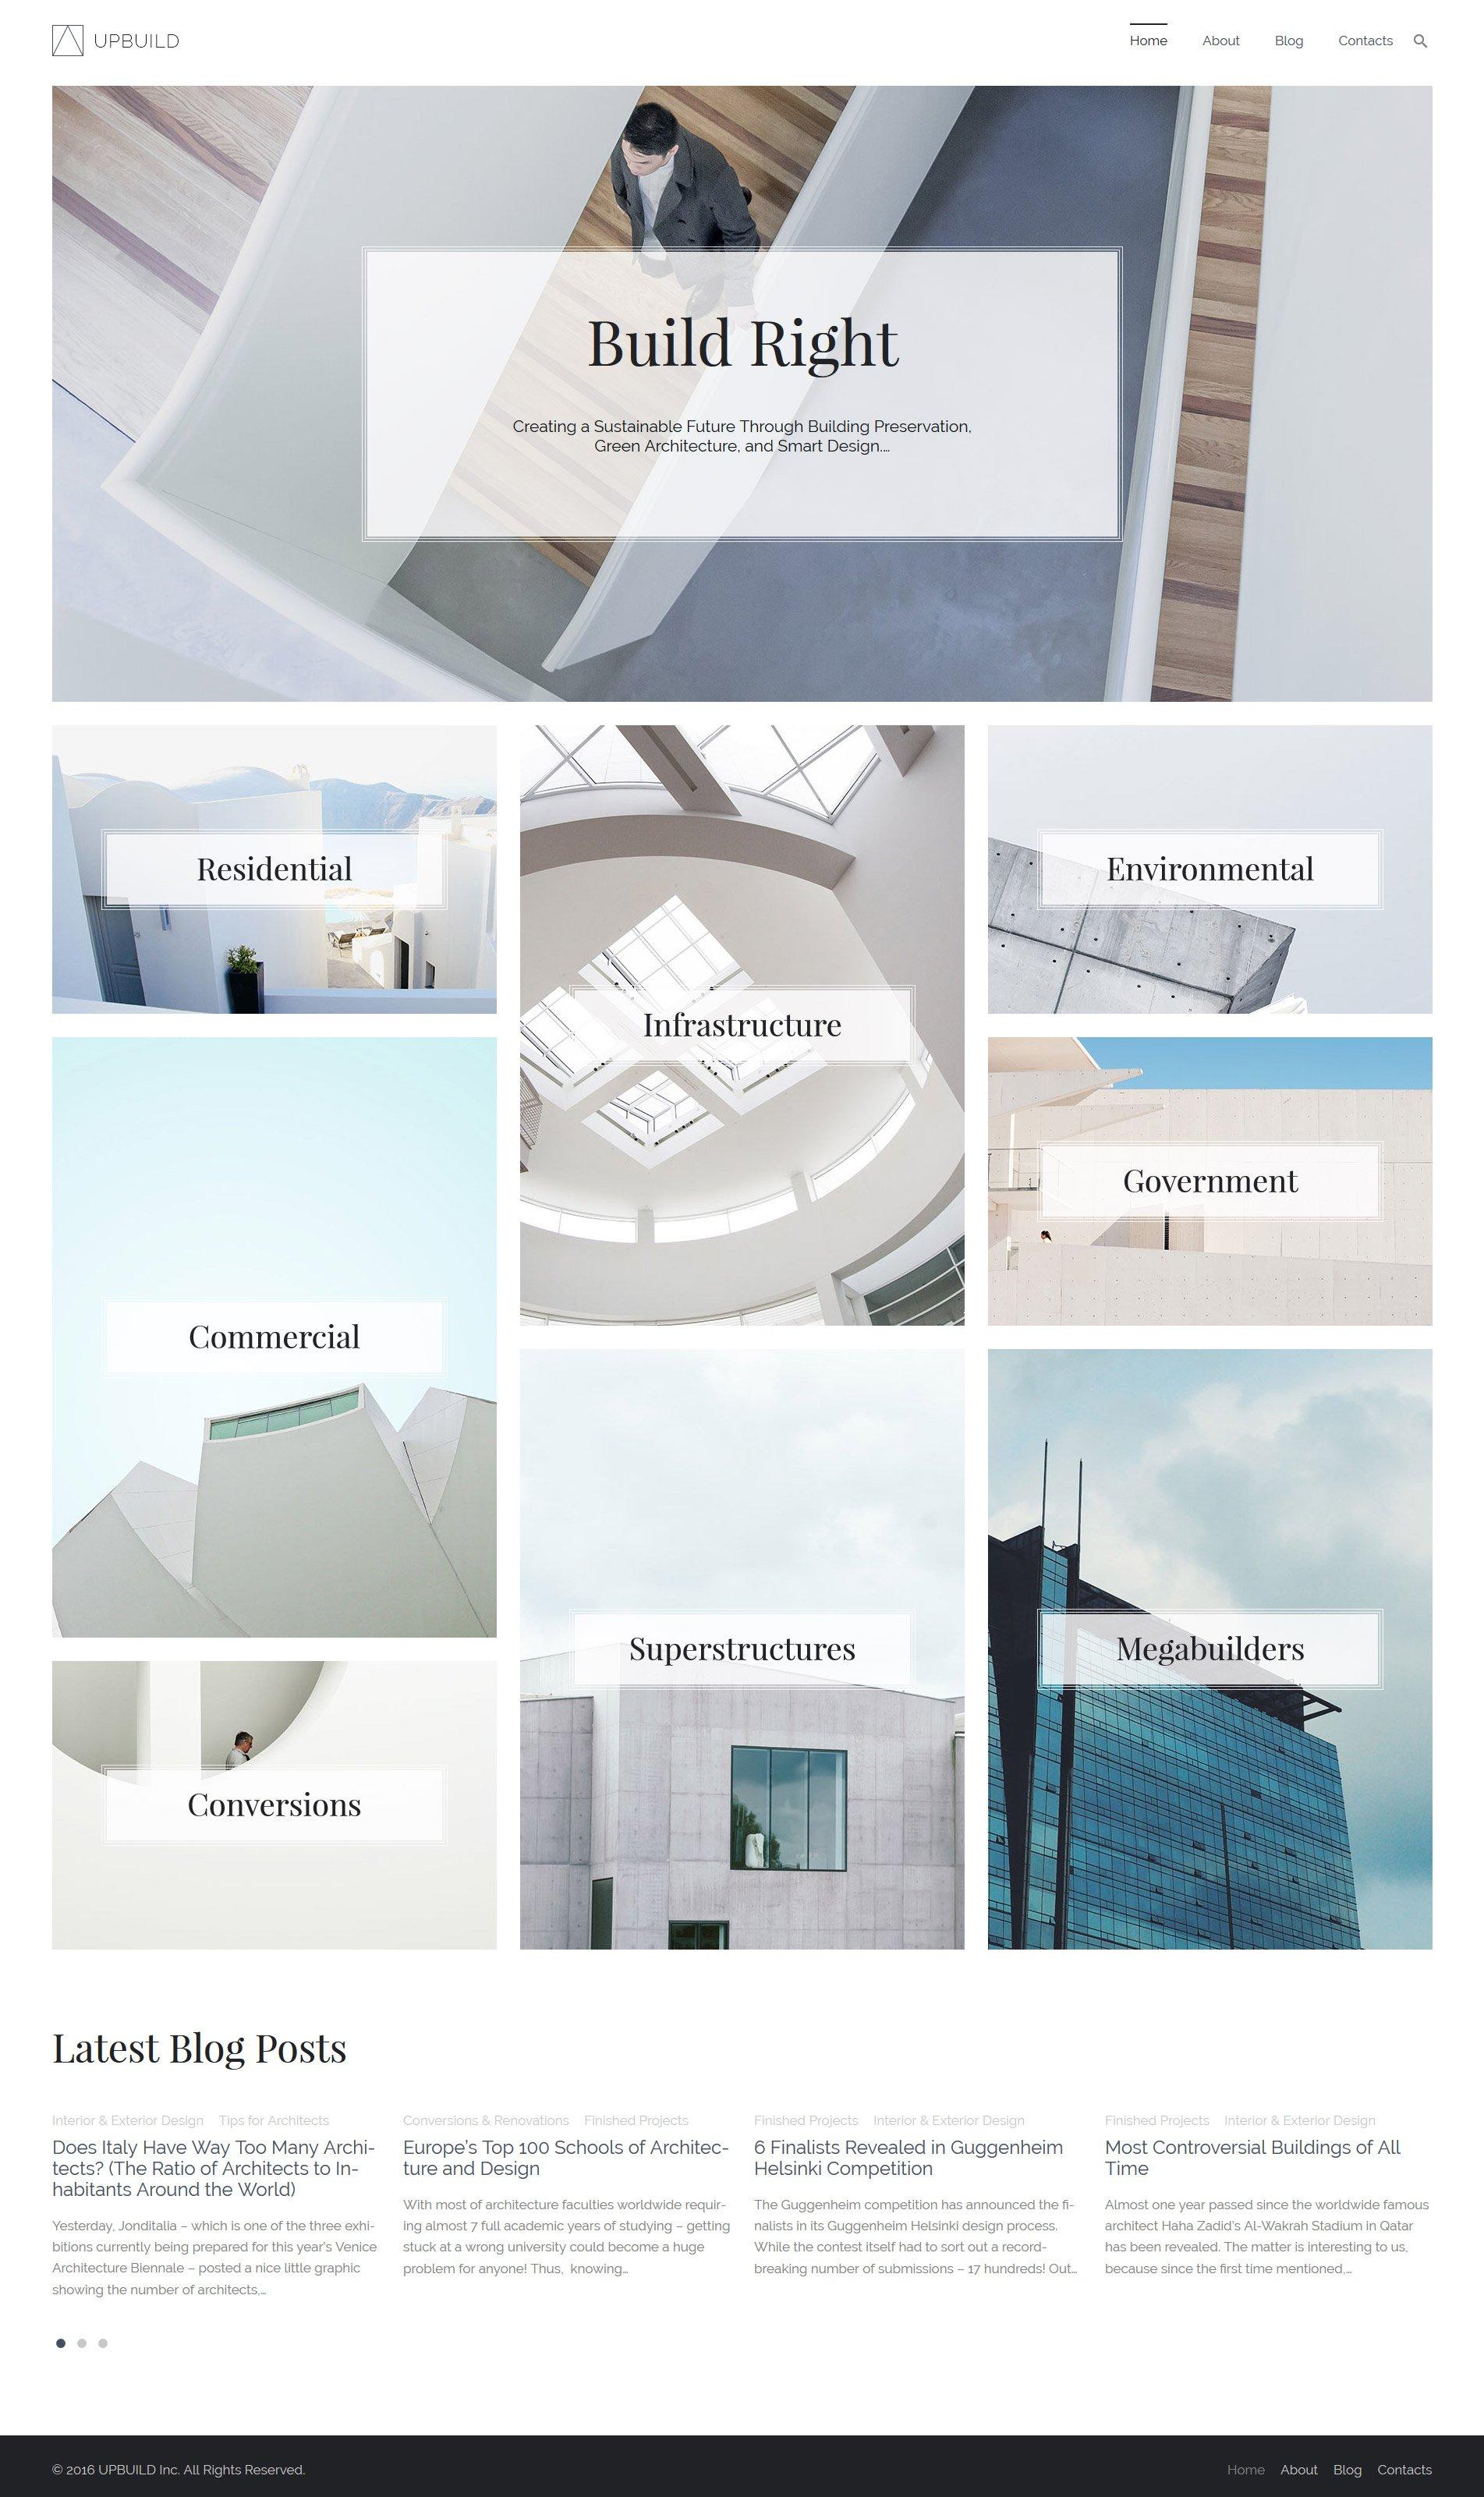 """Upbuild - Architecture Firm"" 响应式WordPress模板 #59021 - 截图"